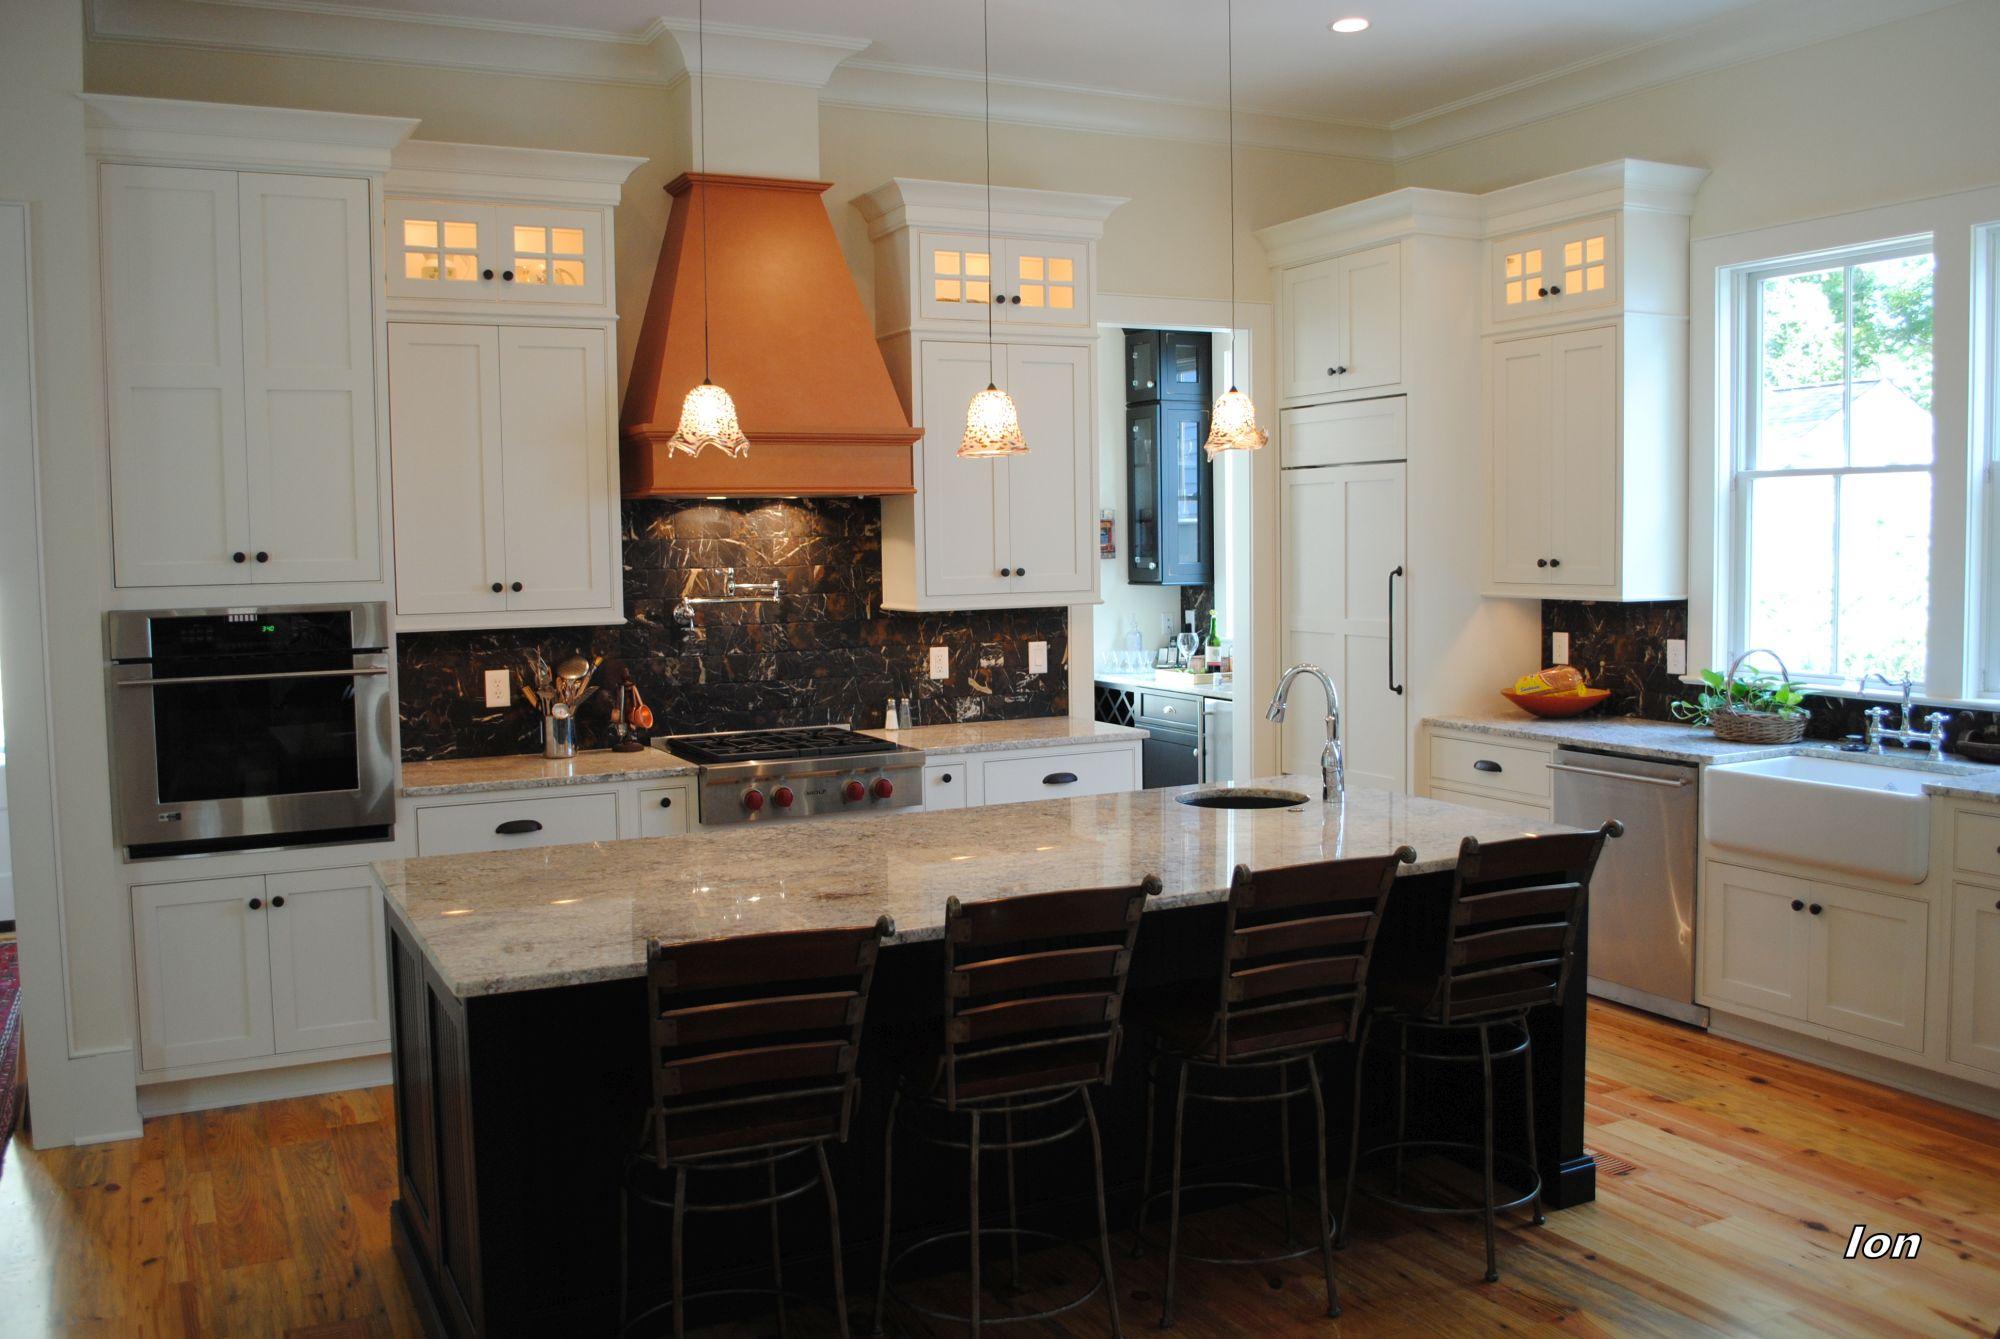 Austin Kitchen Remodeling Gallery Daniel Island Sc Mevers Kitchens Baths